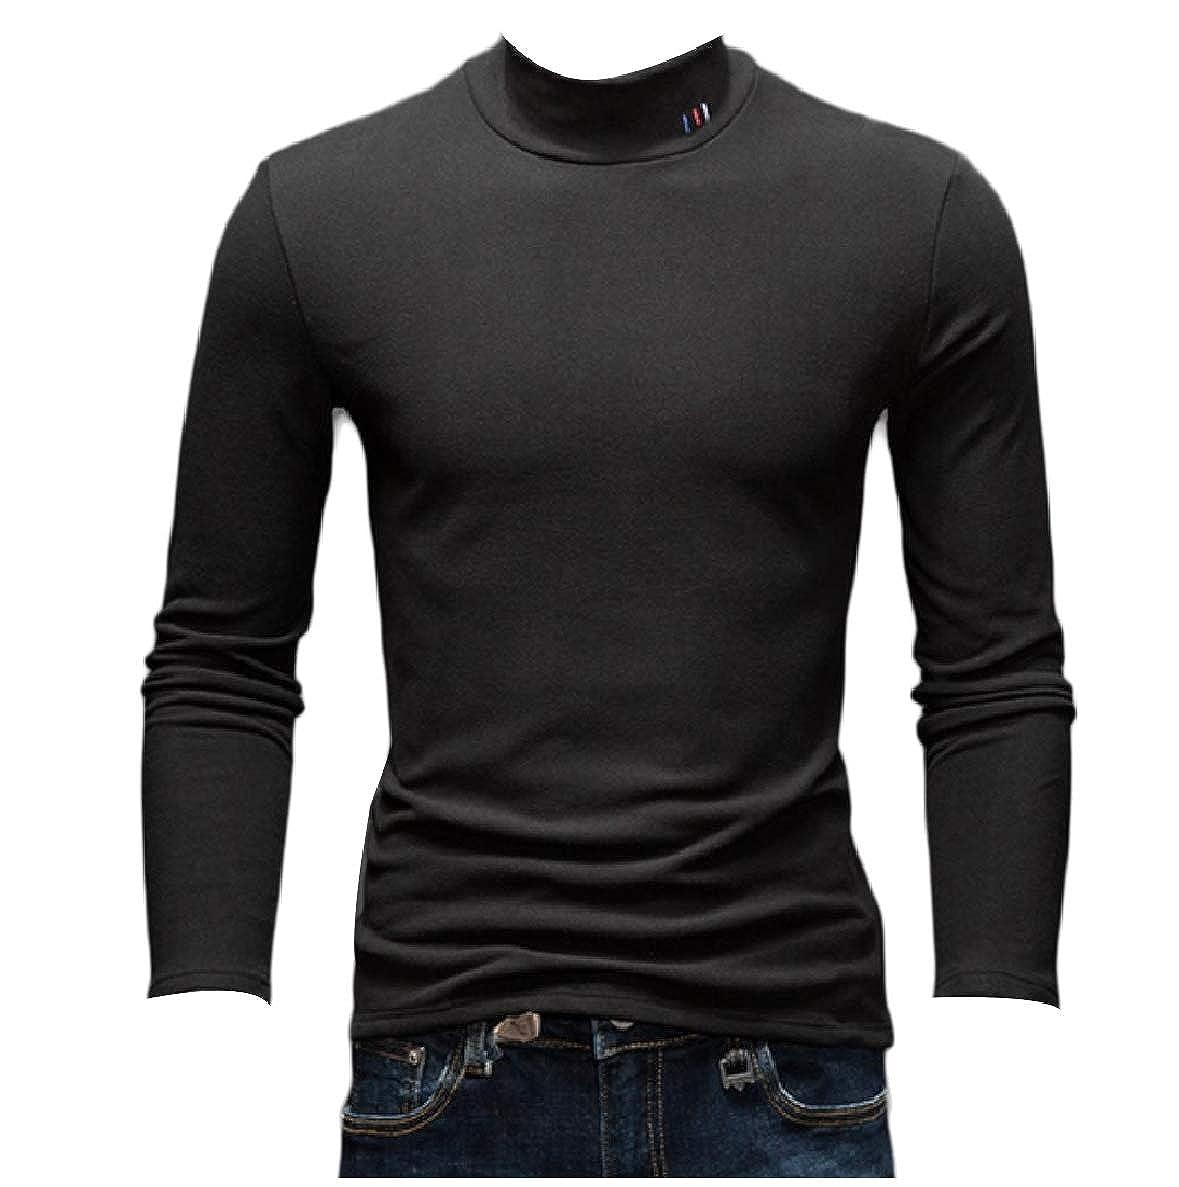 Winwinus Mens Skinny Classic Rib Blouse Tunic Tops Casual Thickened Sweater